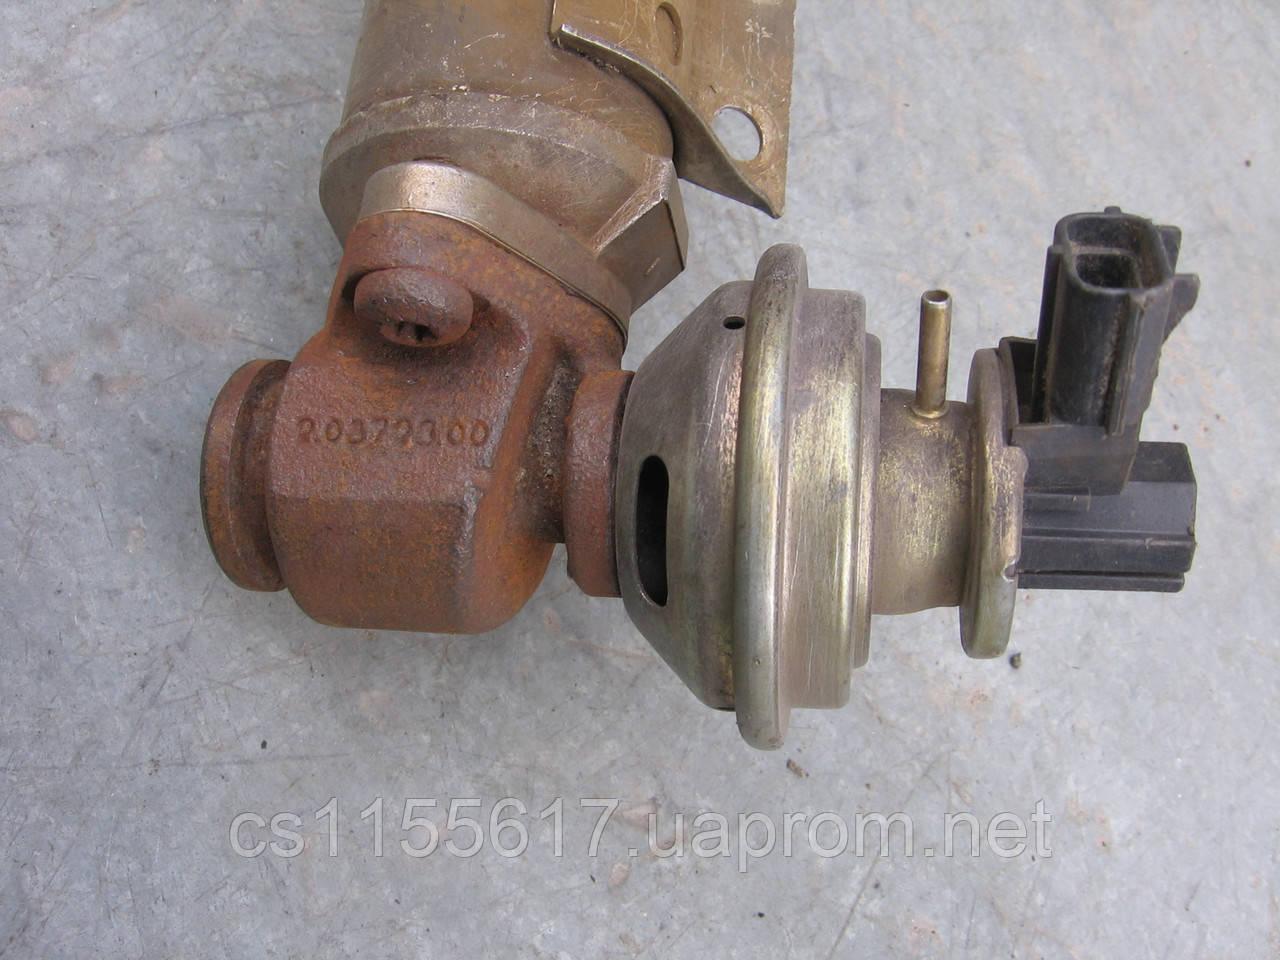 Клапан EGR (72206203, 974F9D475AB) б/у 2.5td на Ford Transit год 1994-2000